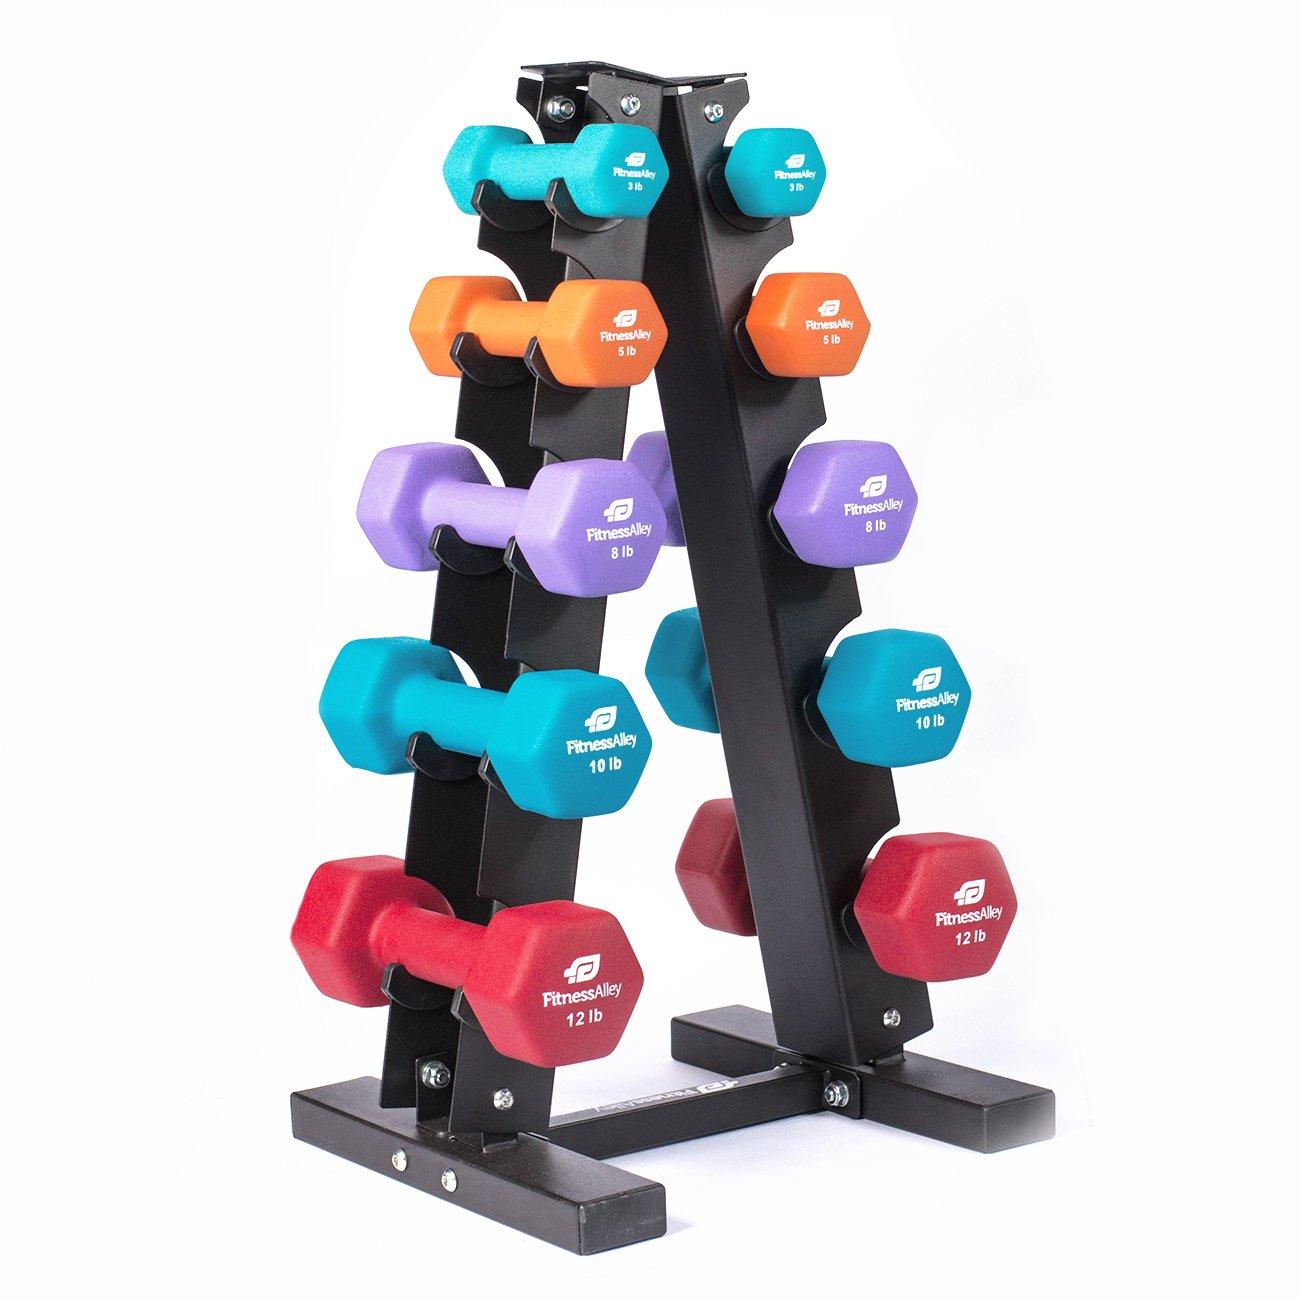 Fitness Alley Steel Dumbbell Rack - 5 Tier Weight Holder & 5 Tier Weight Rack Dumbbell Stand - Dumbbell Holder - Dumbbell Rack Stand (5 Tier Rack & 3,5,8,10,12 lbs Dumbbells)